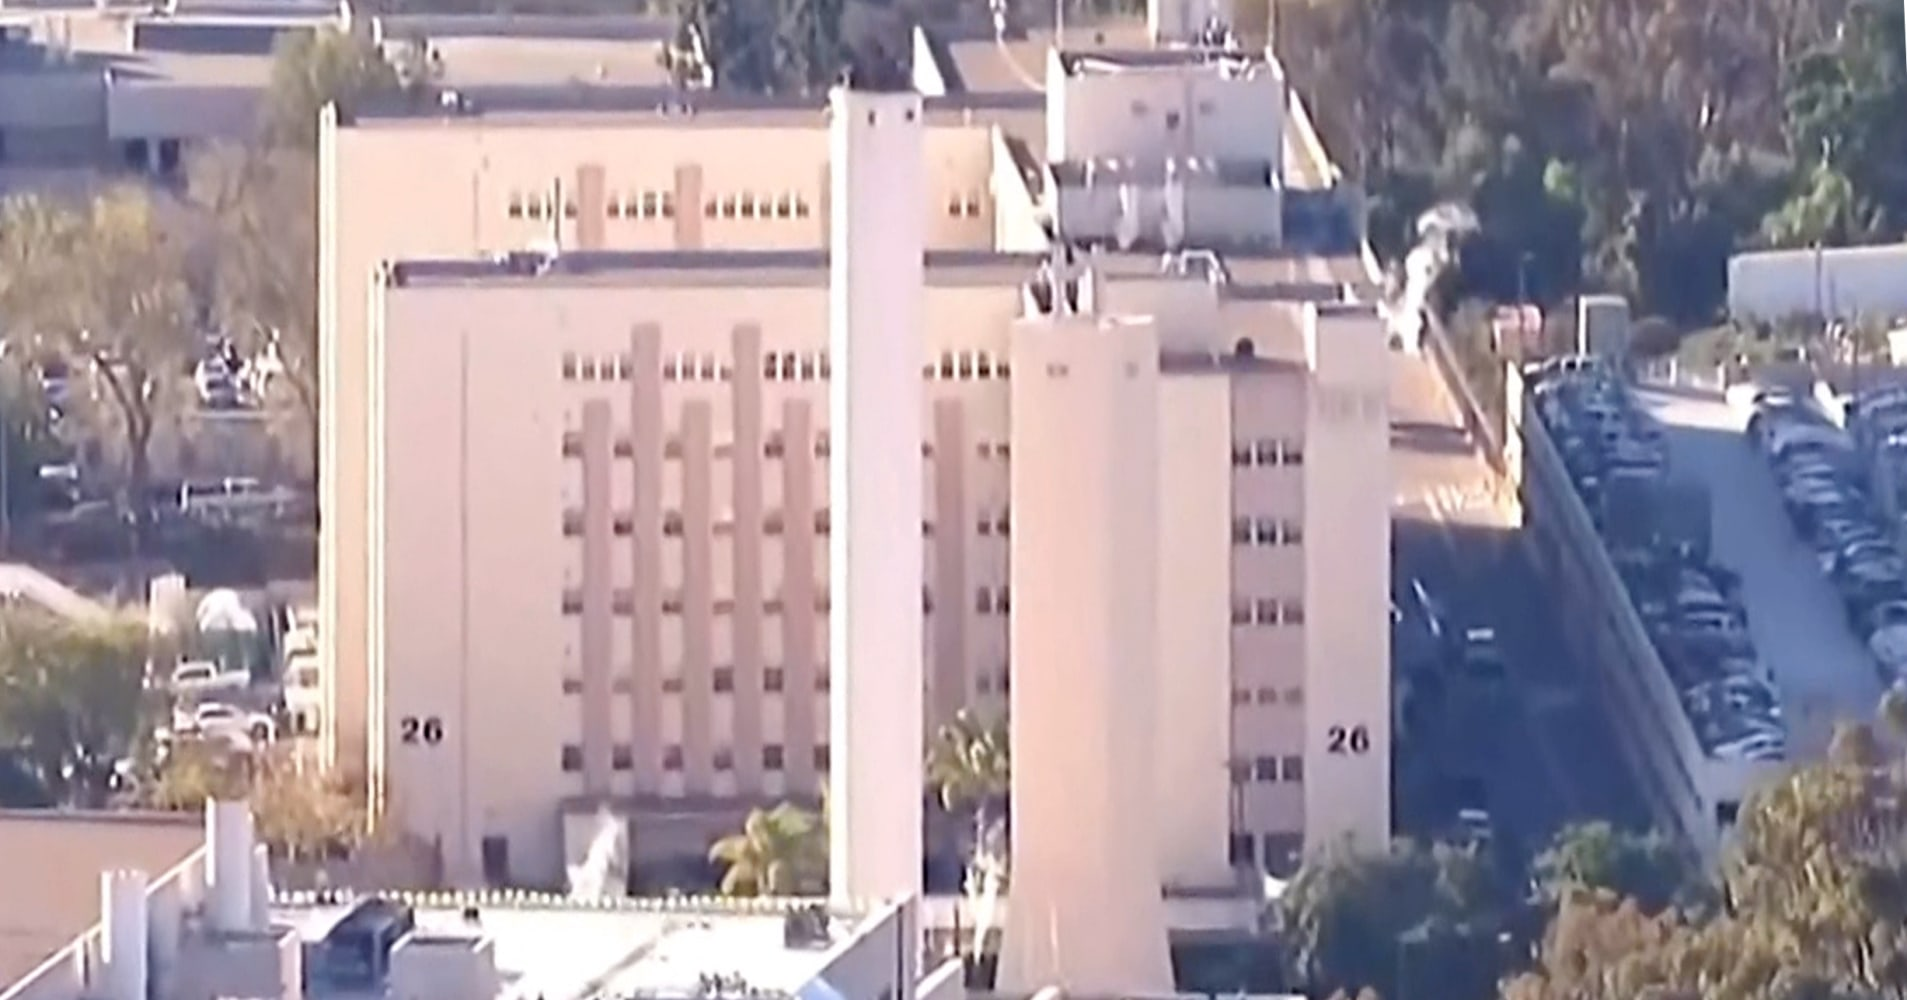 Naval Medical Center San Diego Emergency Room